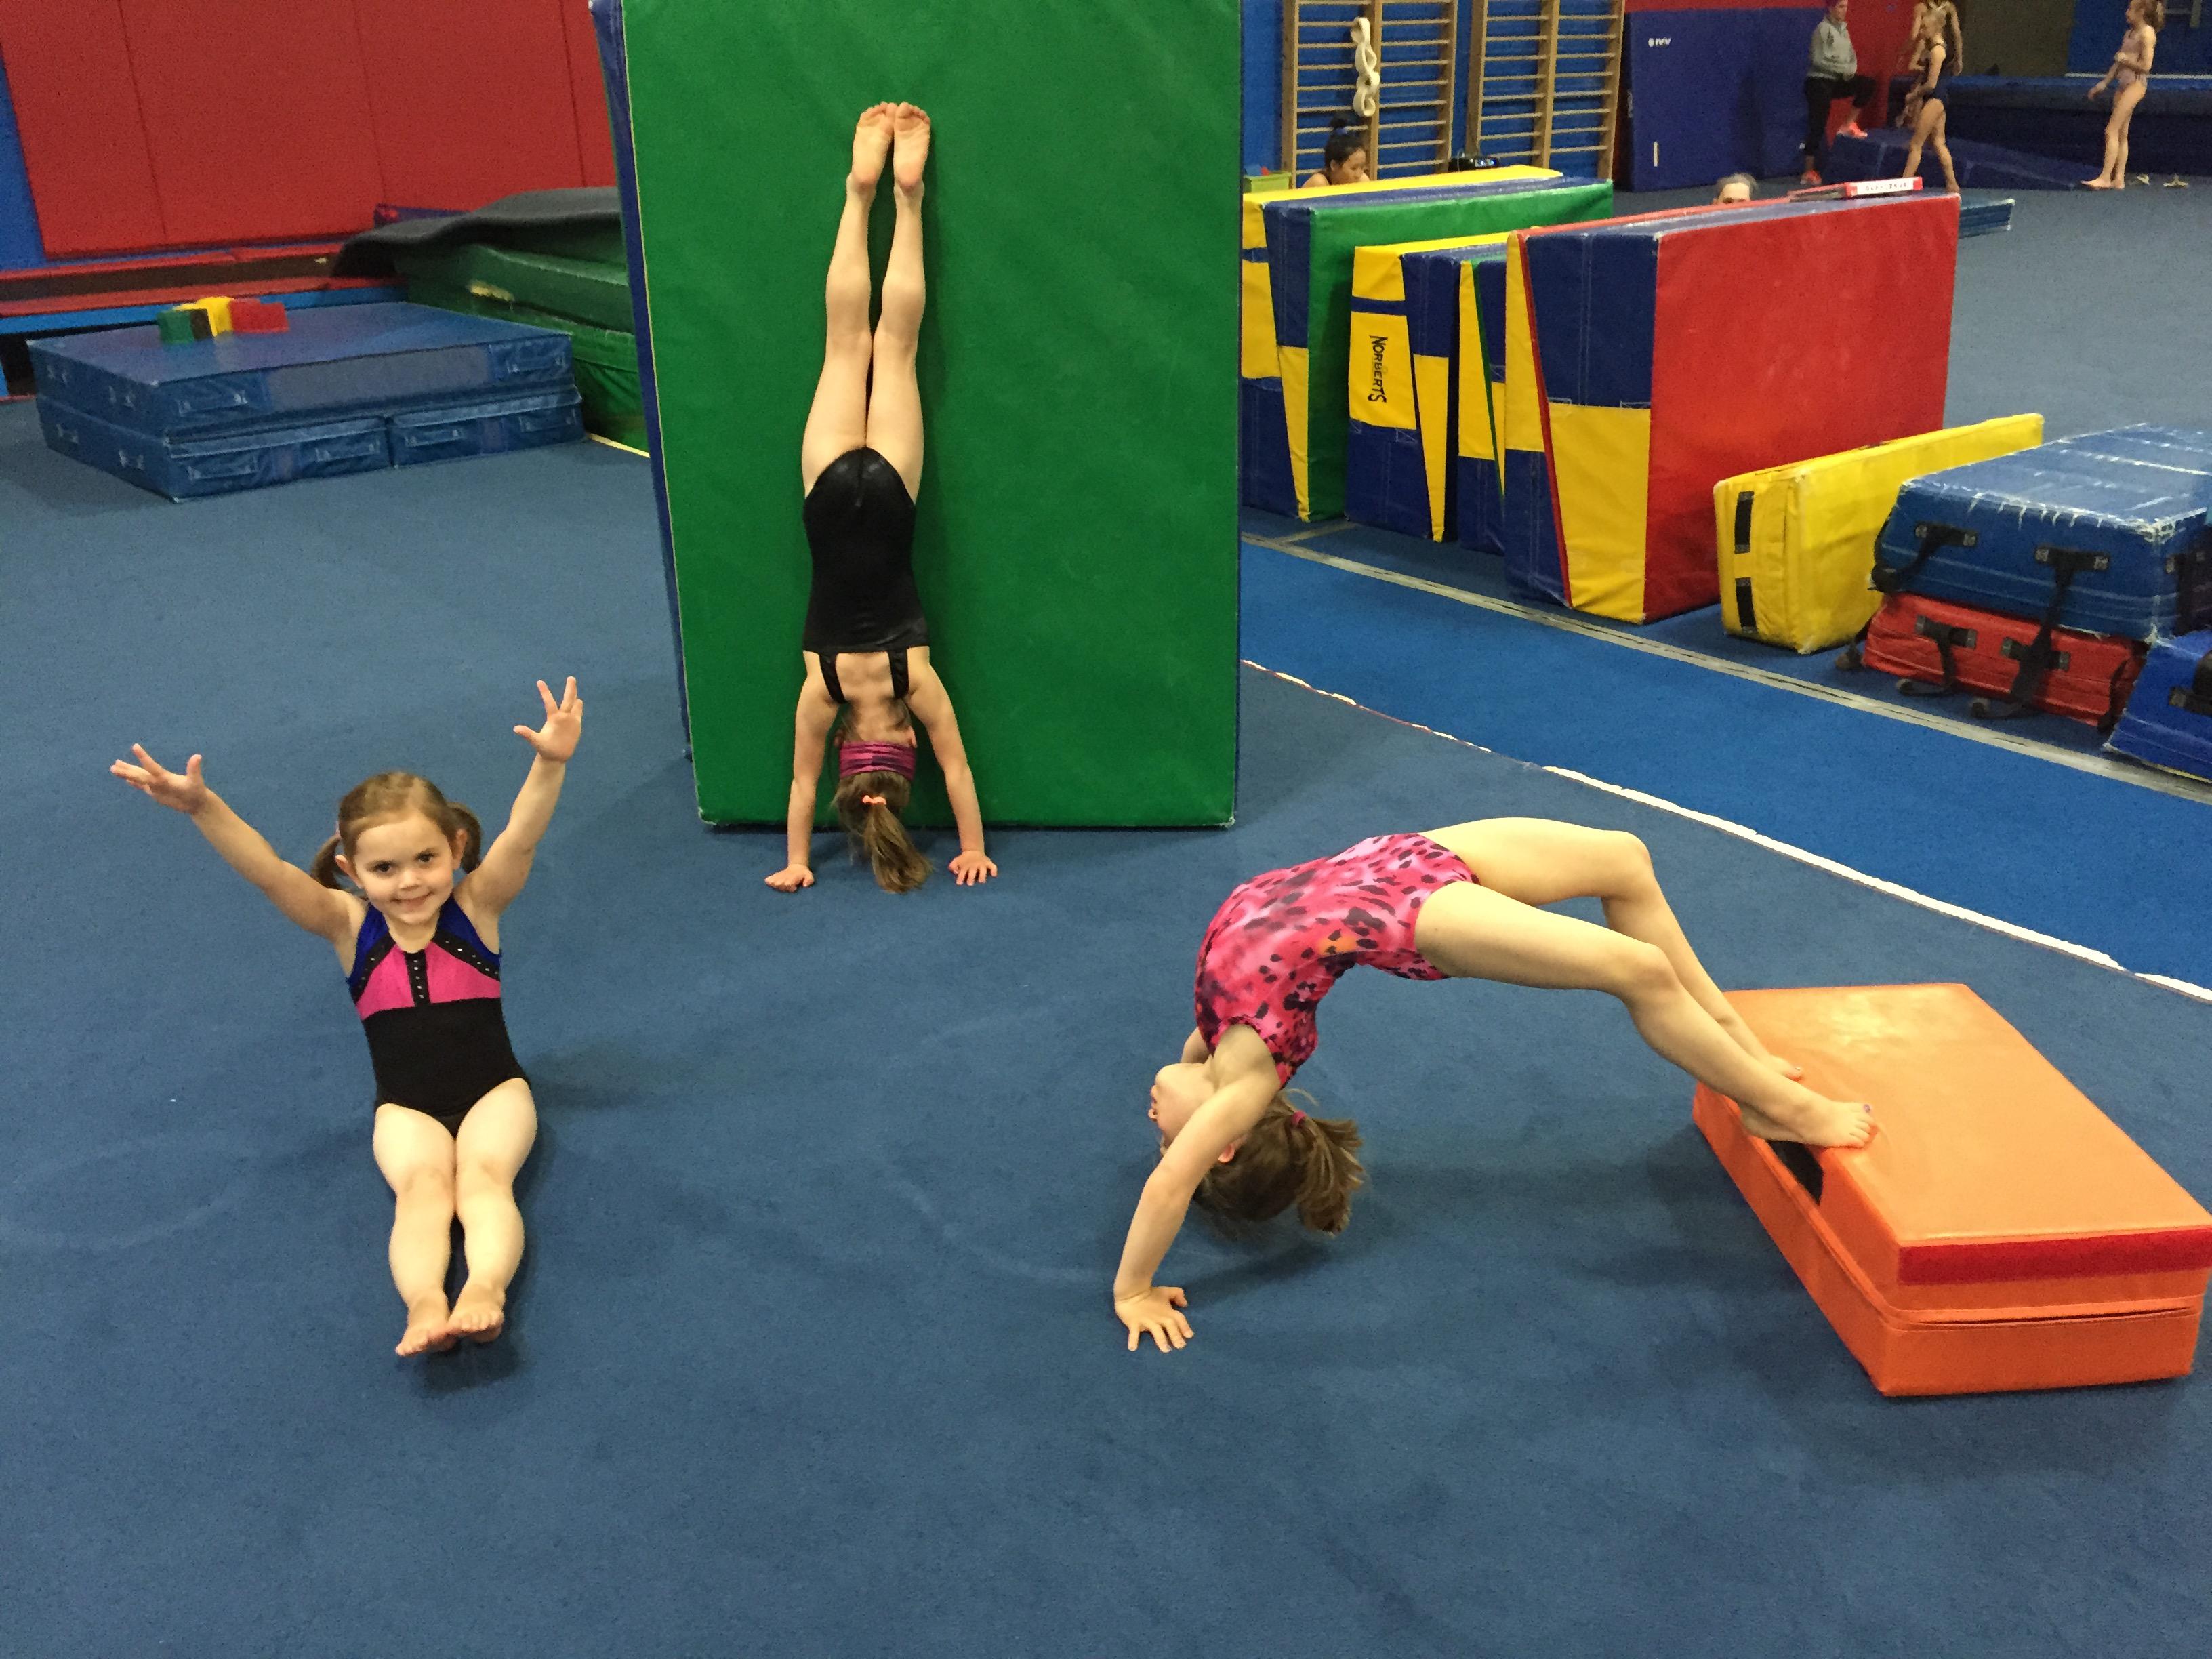 Flips Gymnasts Handstand, Bridge, and Pike Sit